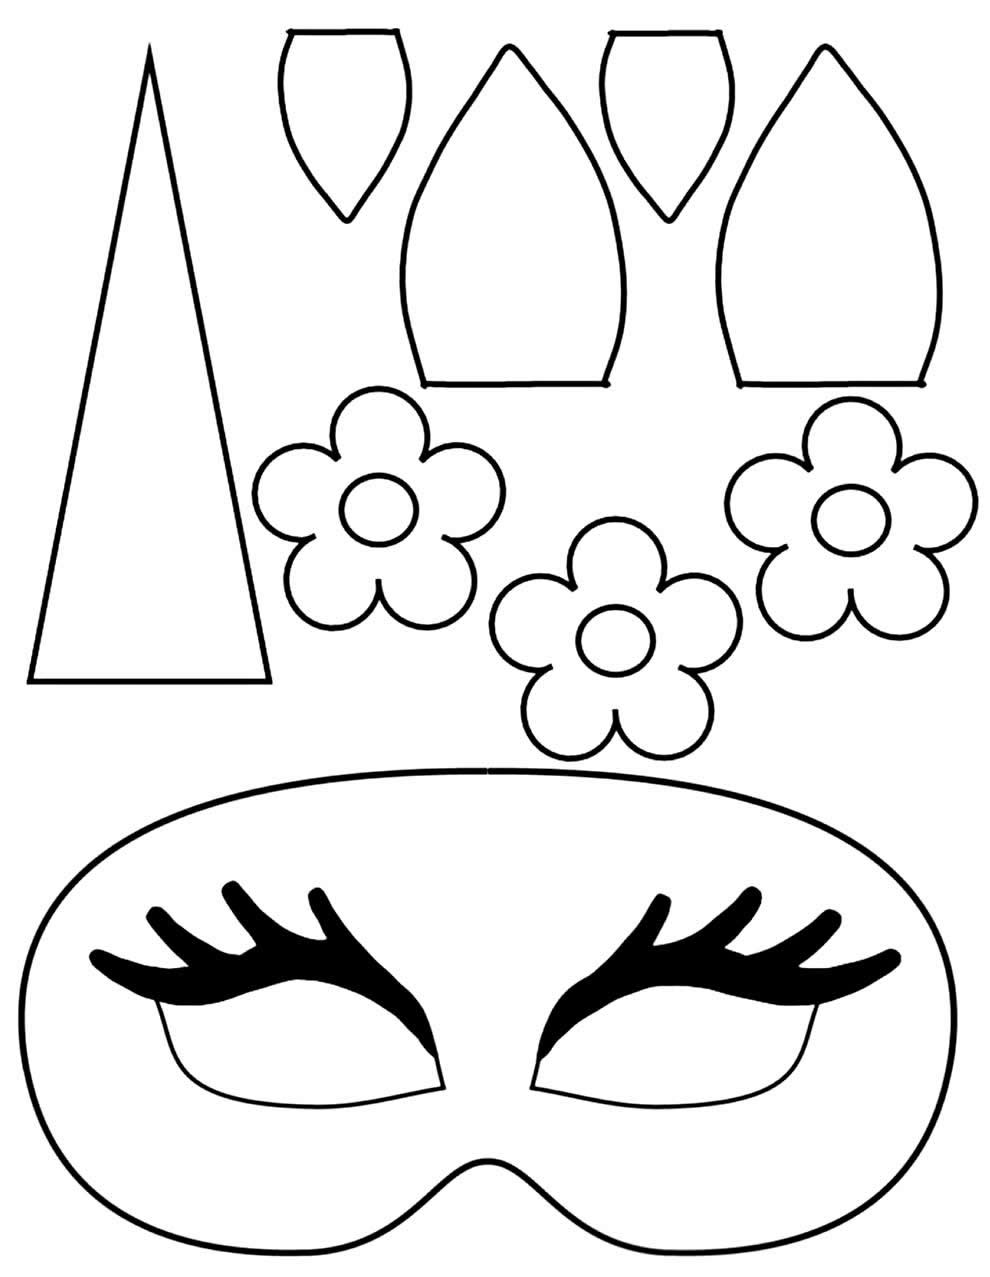 Moldes de máscara de unicórnio